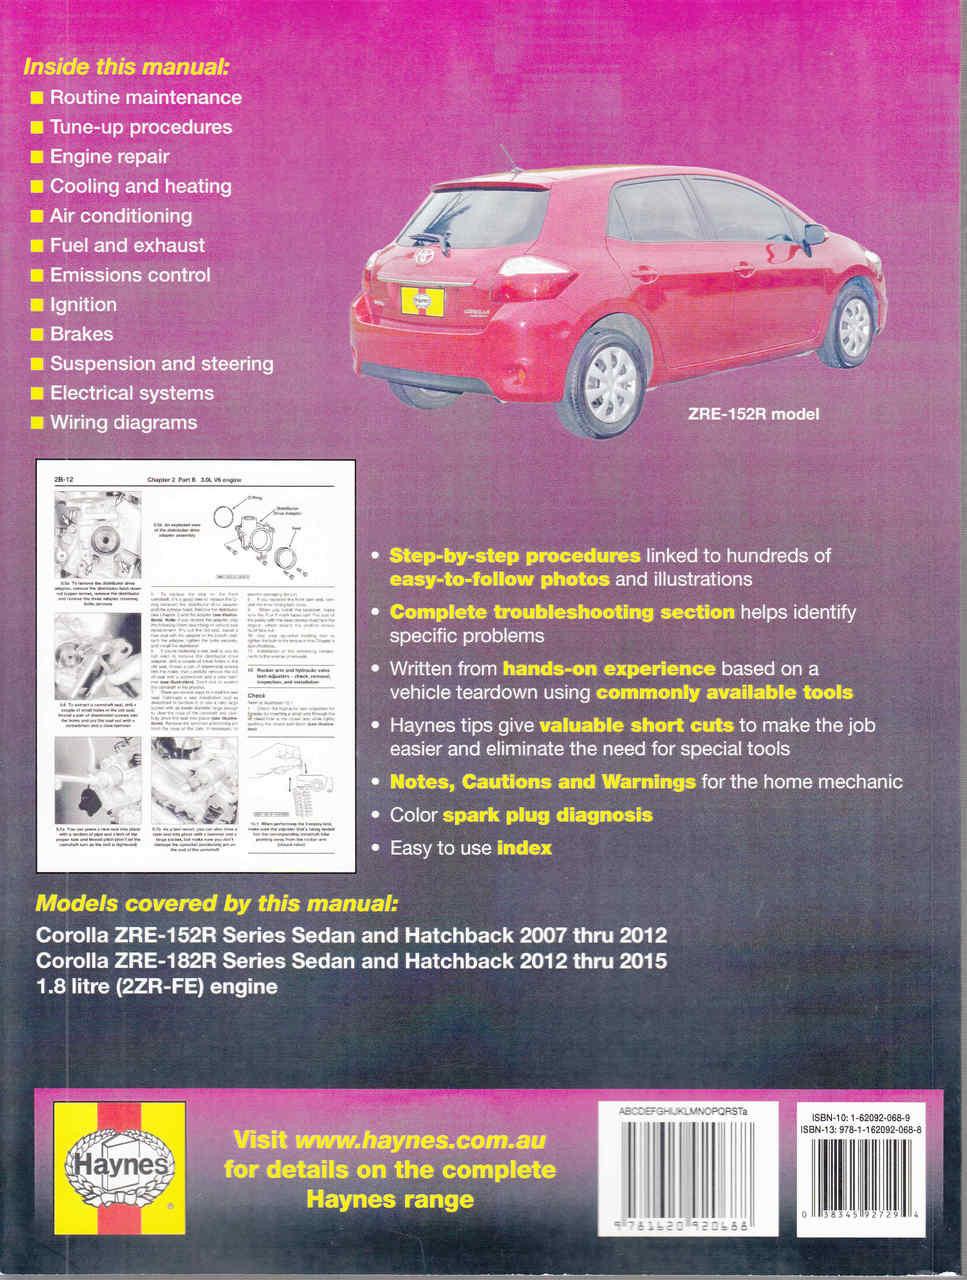 medium resolution of  toyota corolla 1 8 litre engine zre 152r zre 182r 2007 2015 workshop